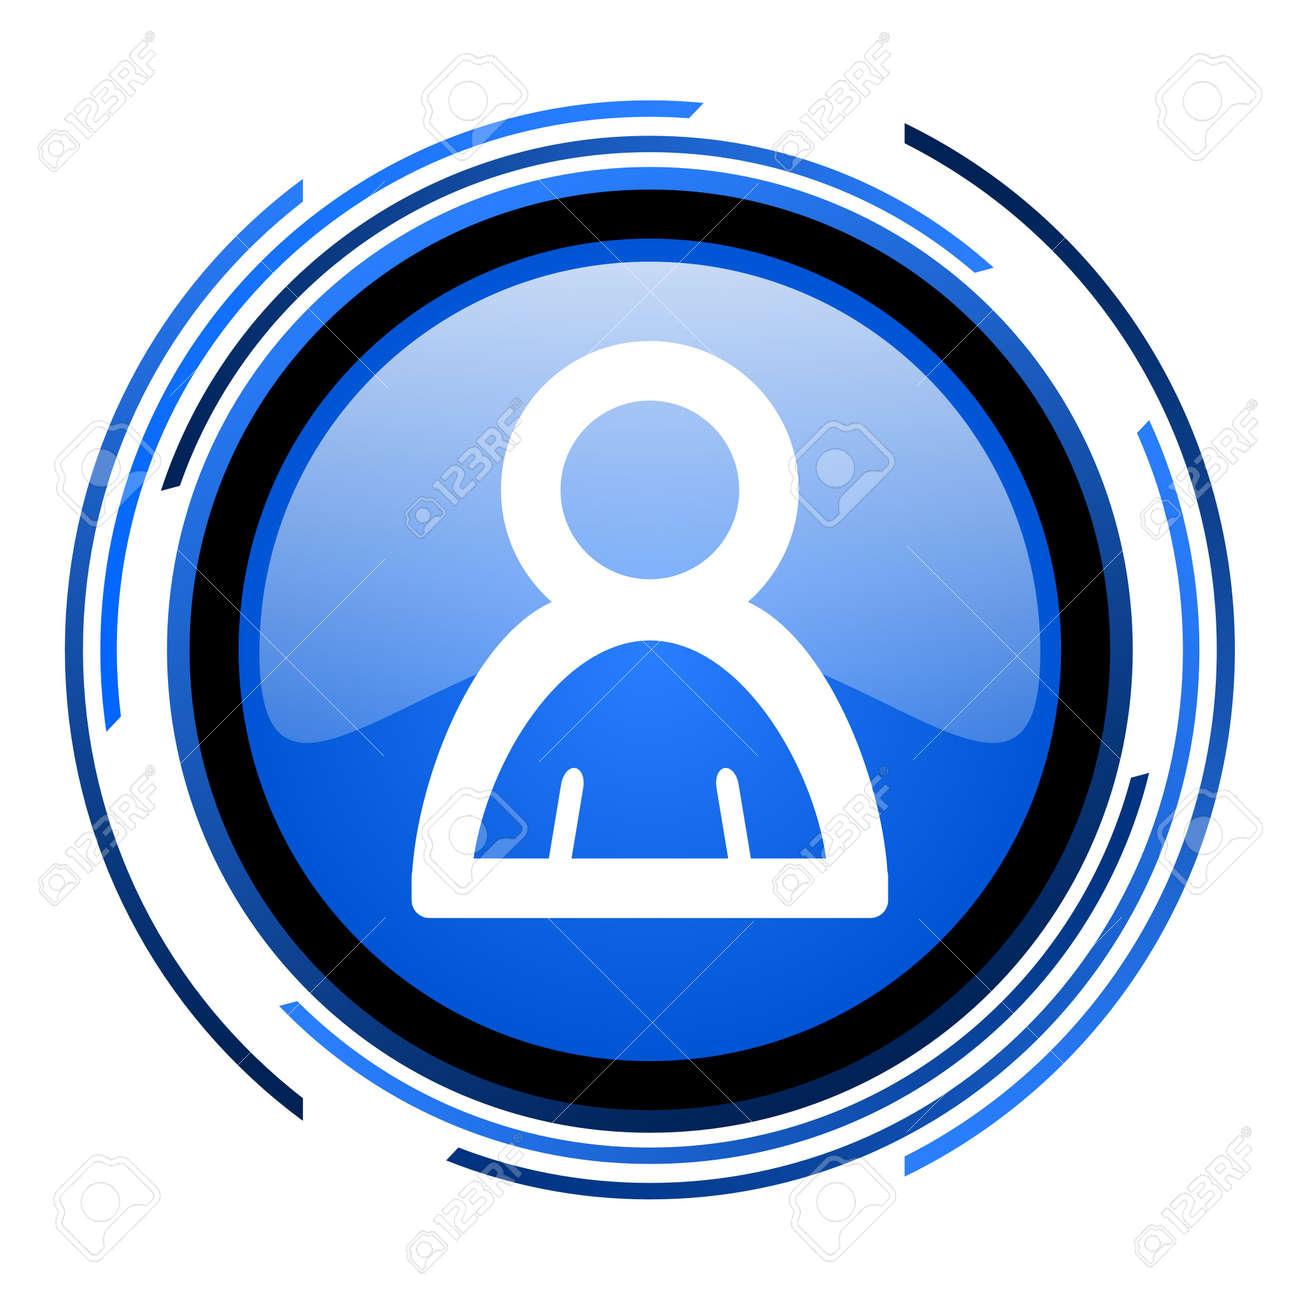 account circle blue glossy icon Stock Photo - 20205591